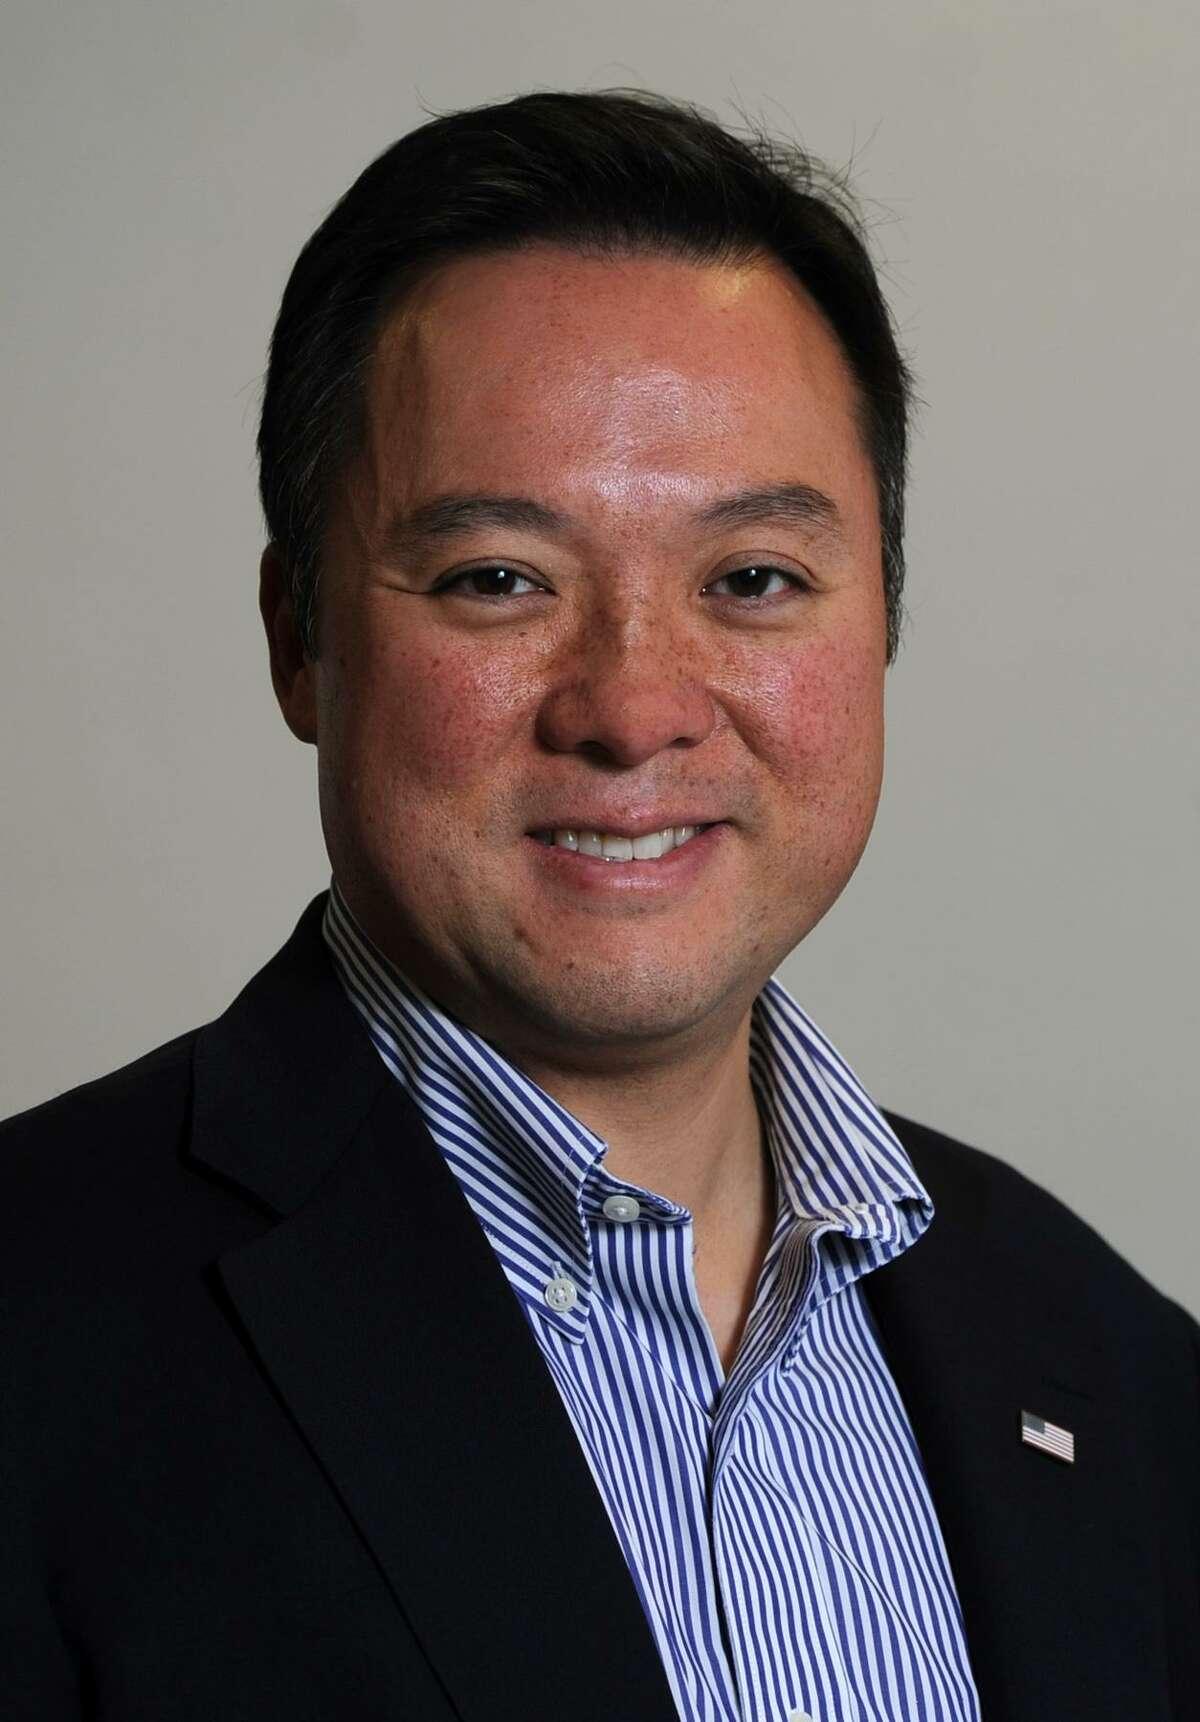 State Rep. William Tong